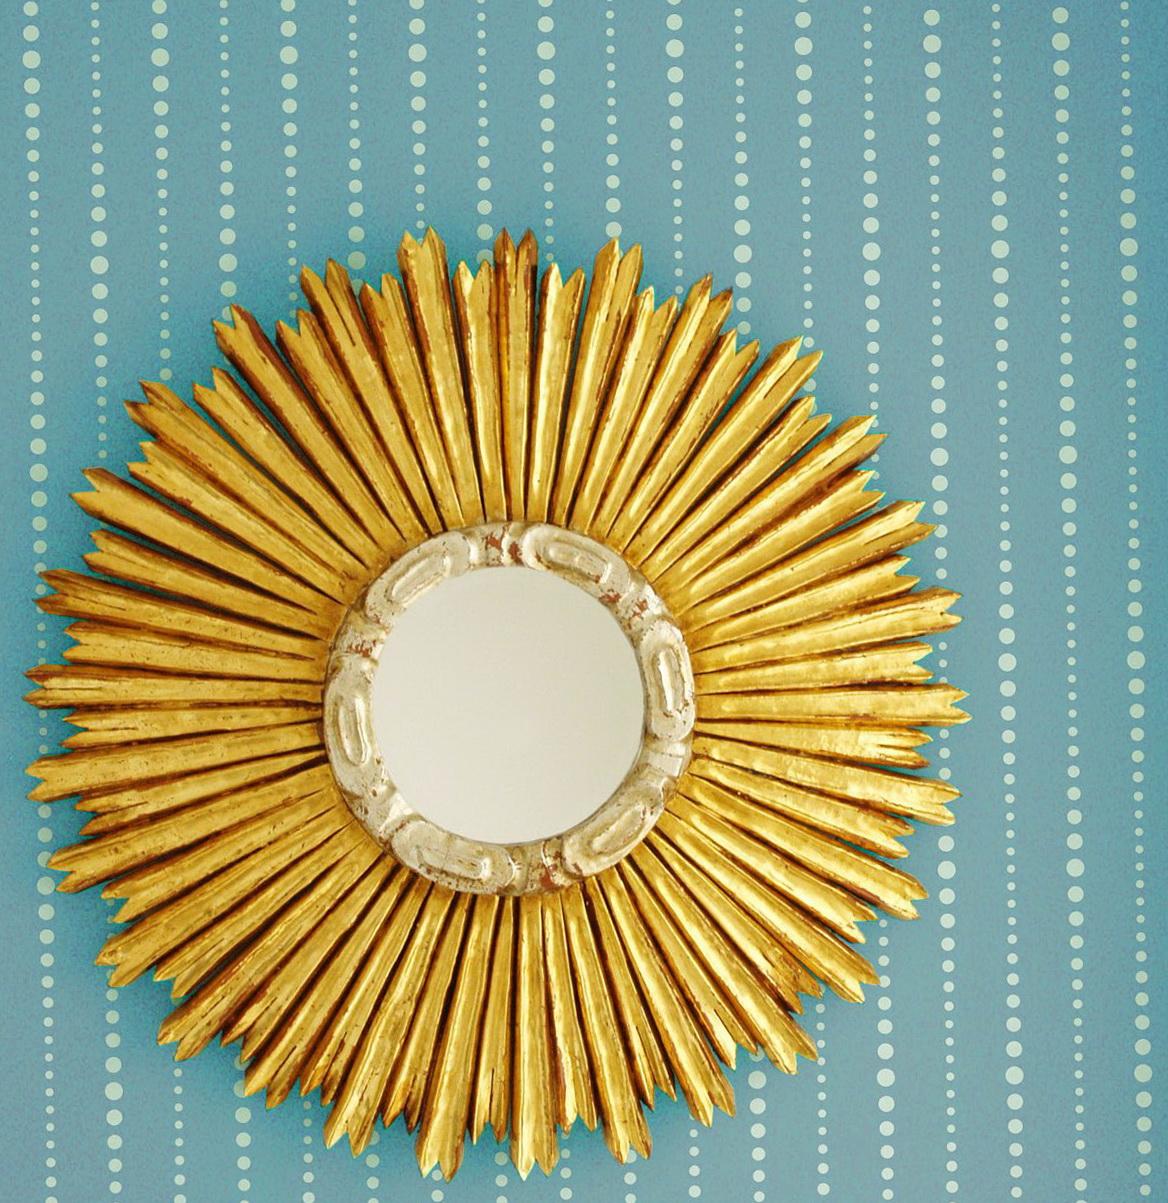 Handmade Wall Mirror Decoration